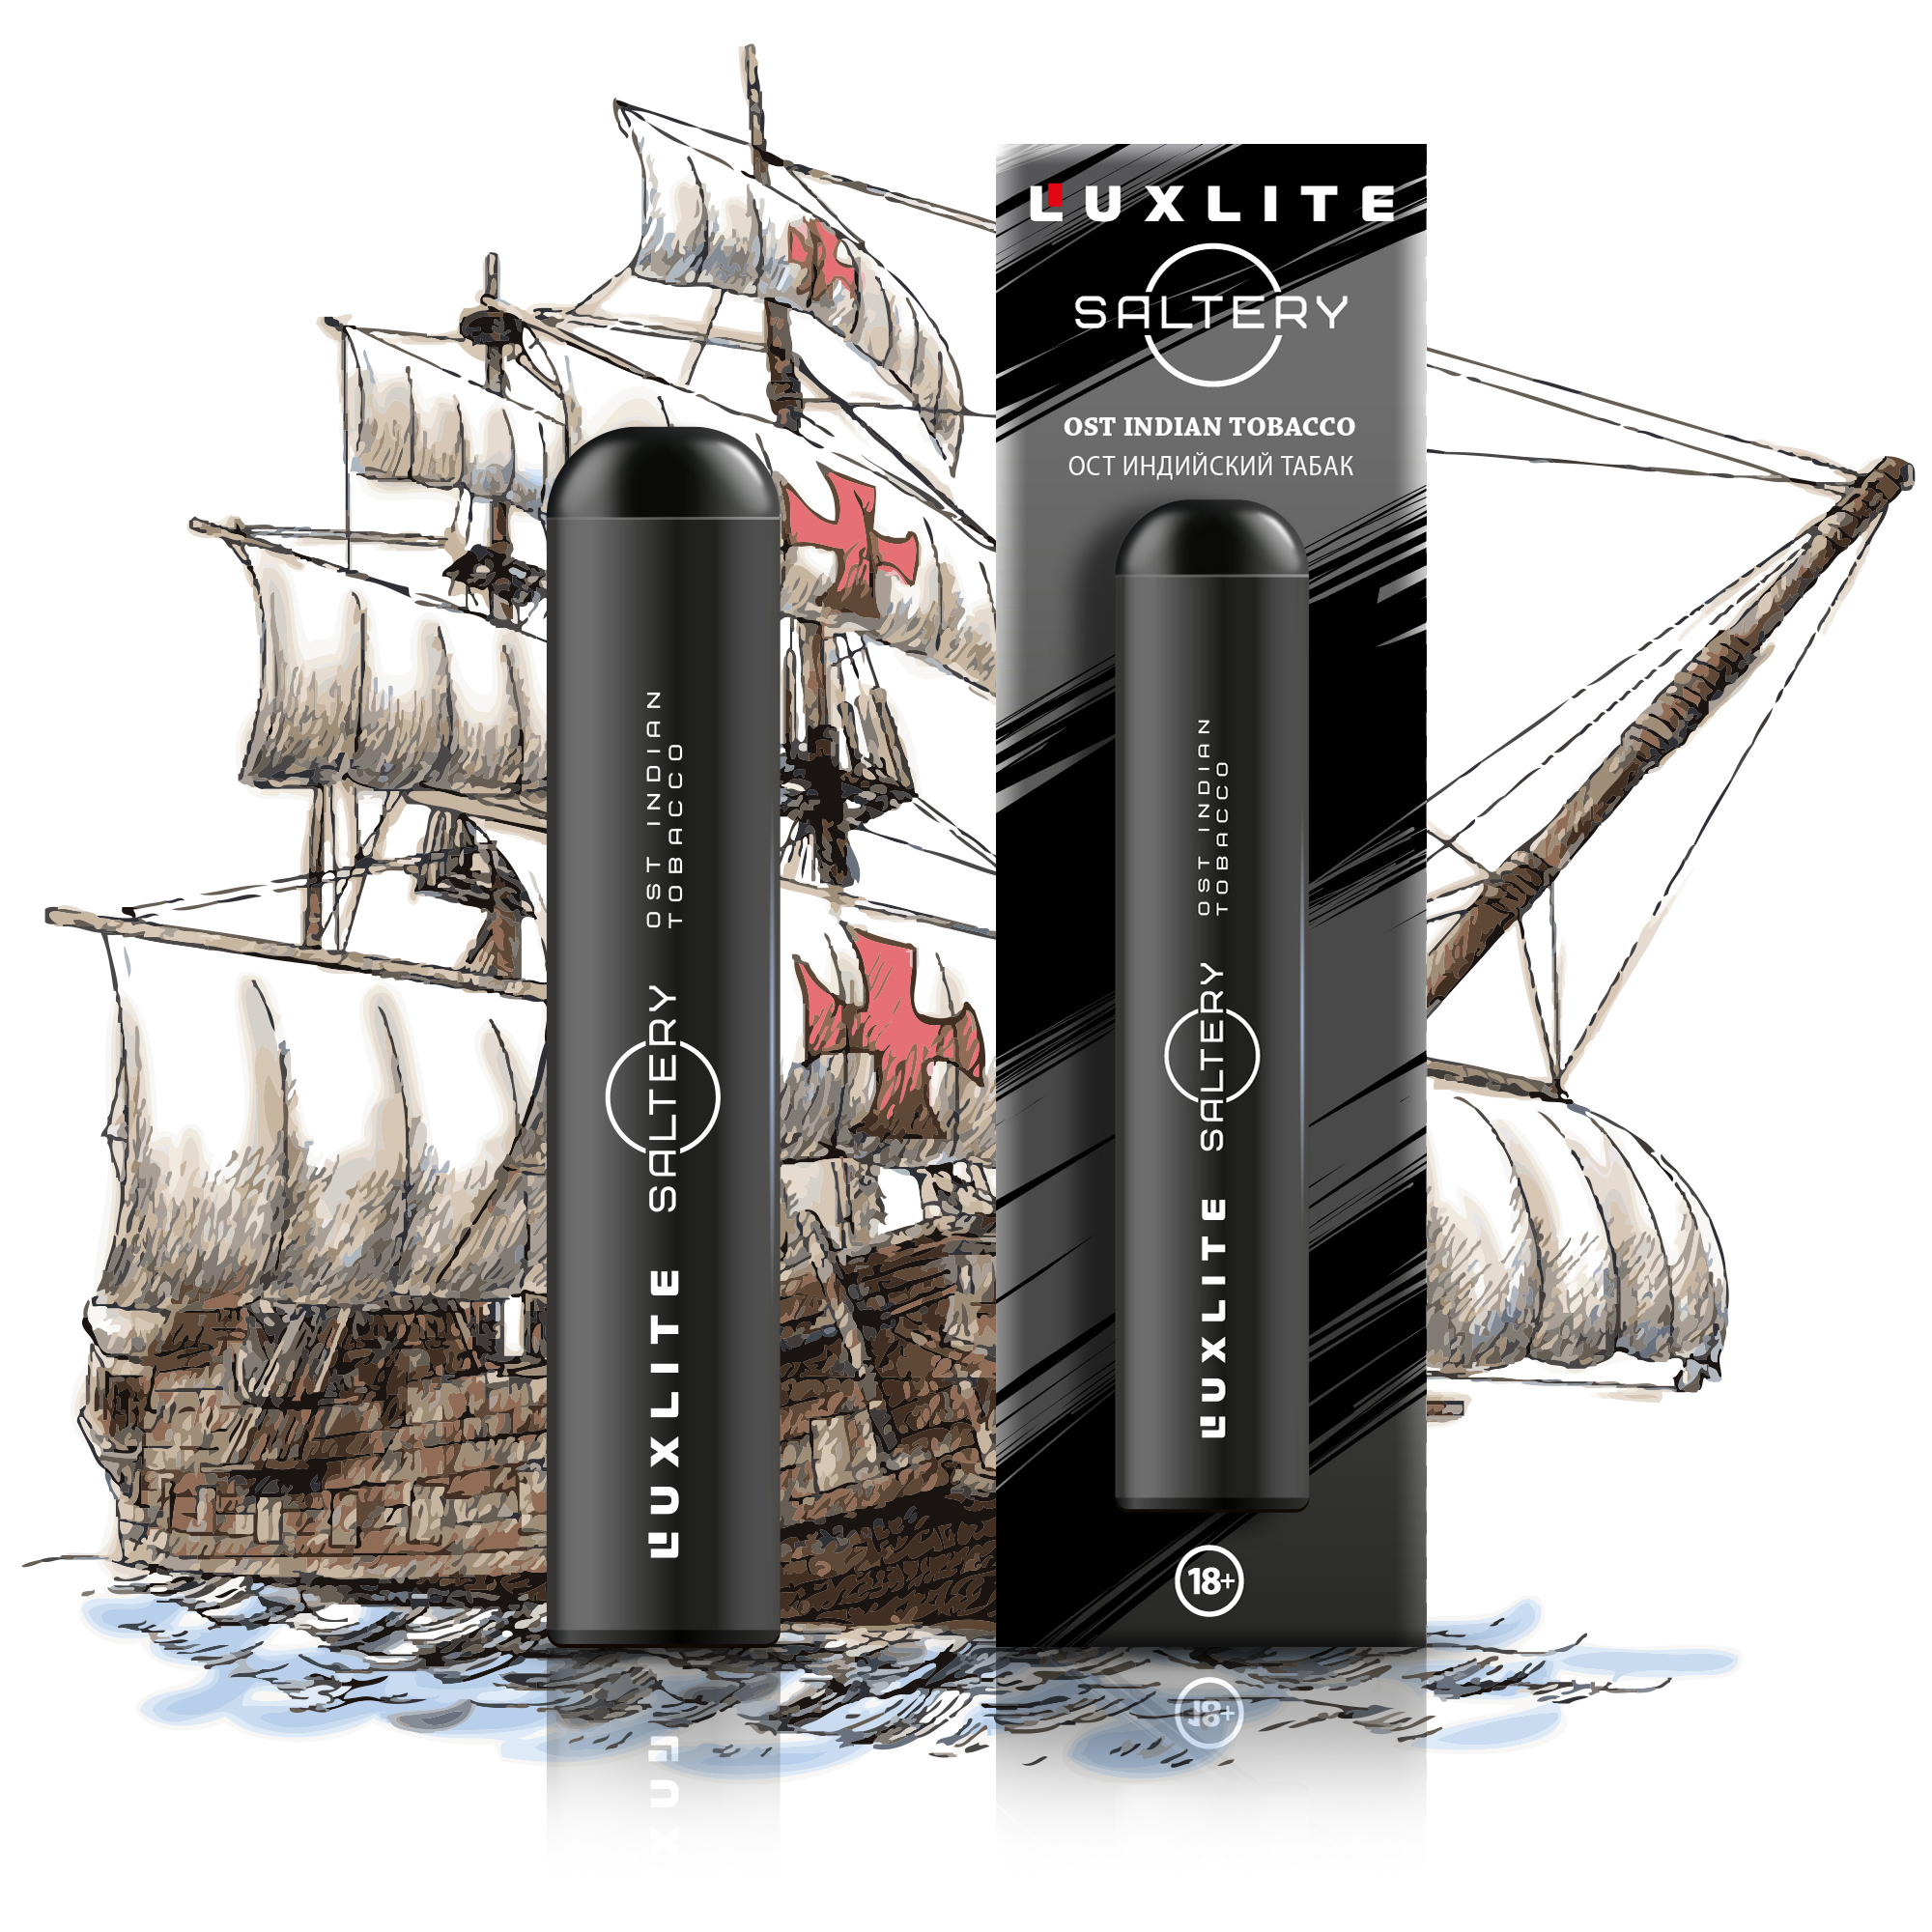 Сигарета Luxlite Saltery электронная со вкусом ост-индийского табака фото